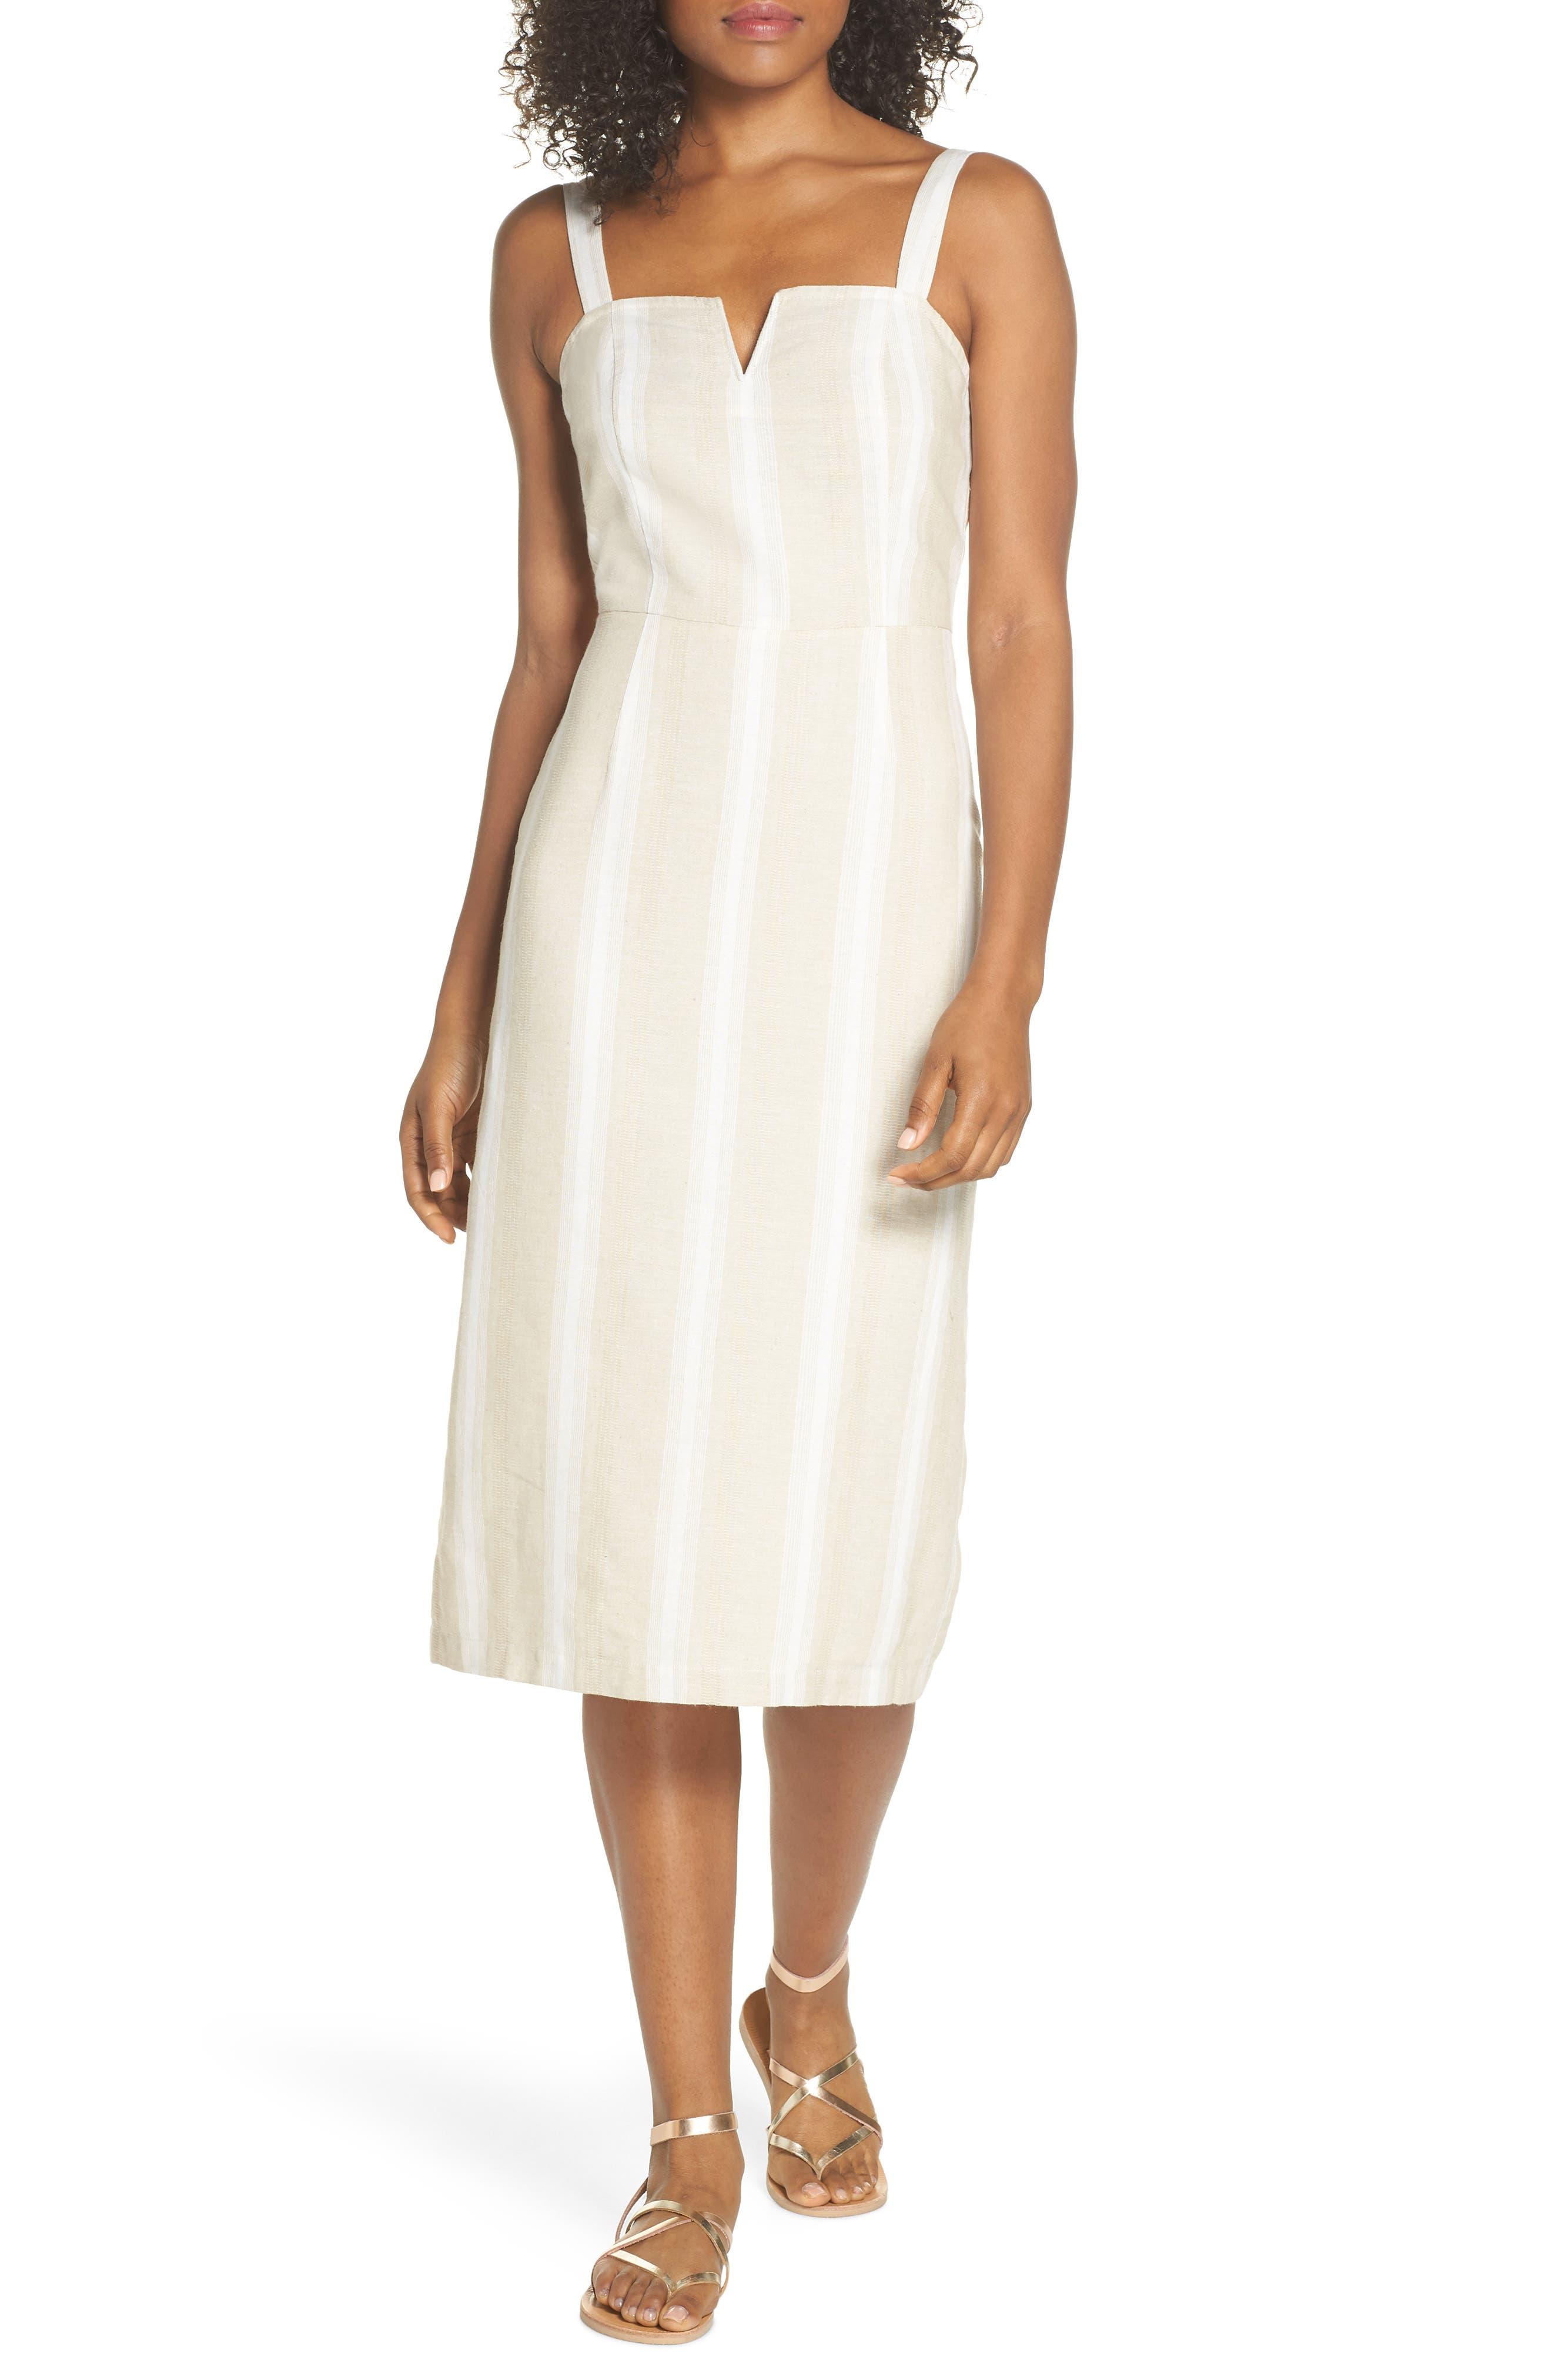 Peekabo Stripe Midi Dress,                         Main,                         color, Sand